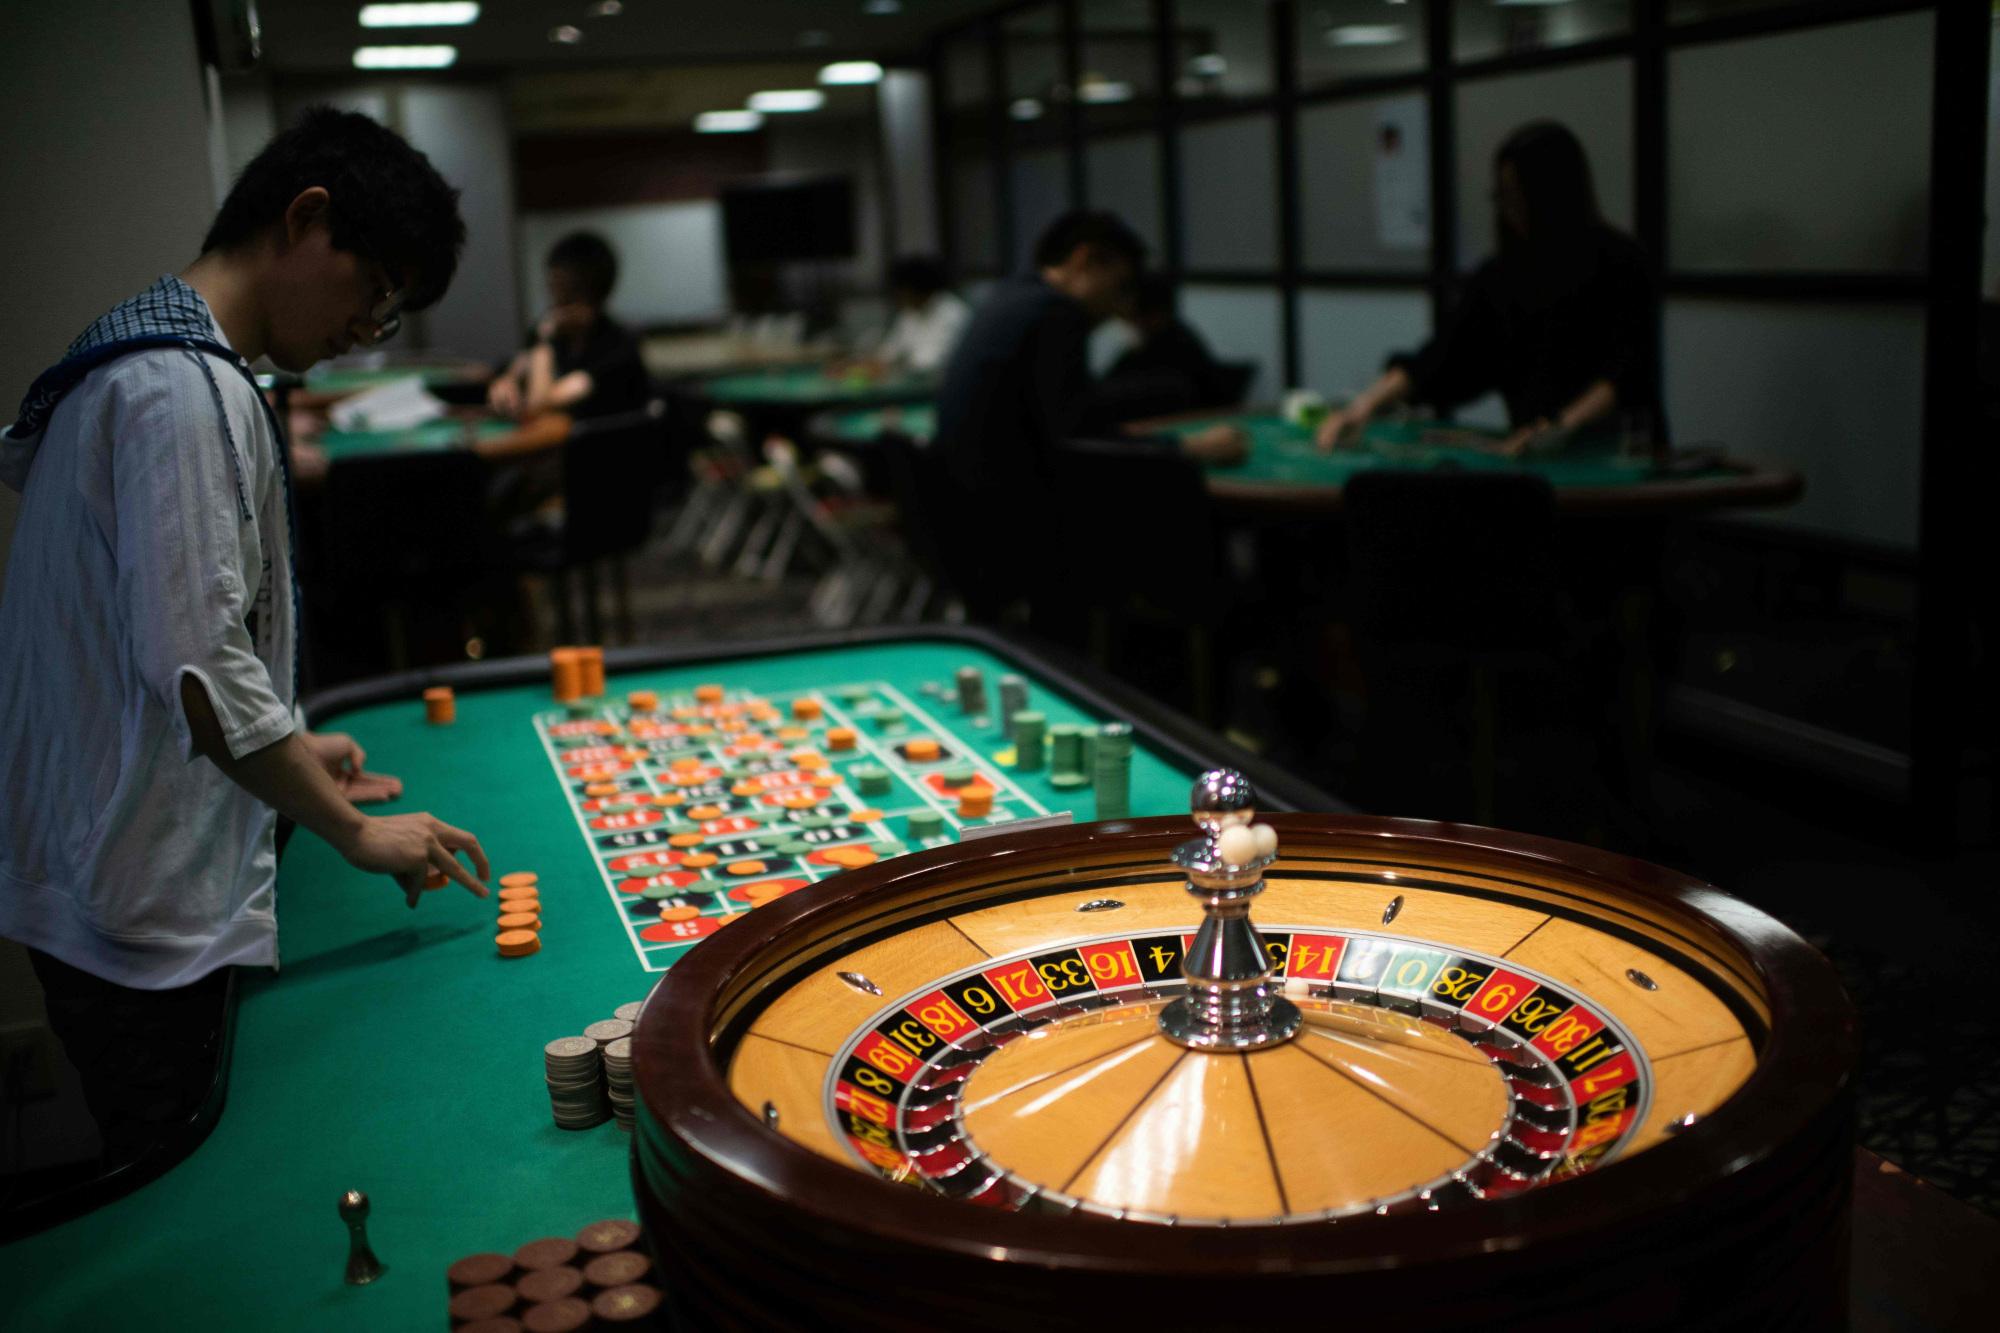 Japan casino bill passes